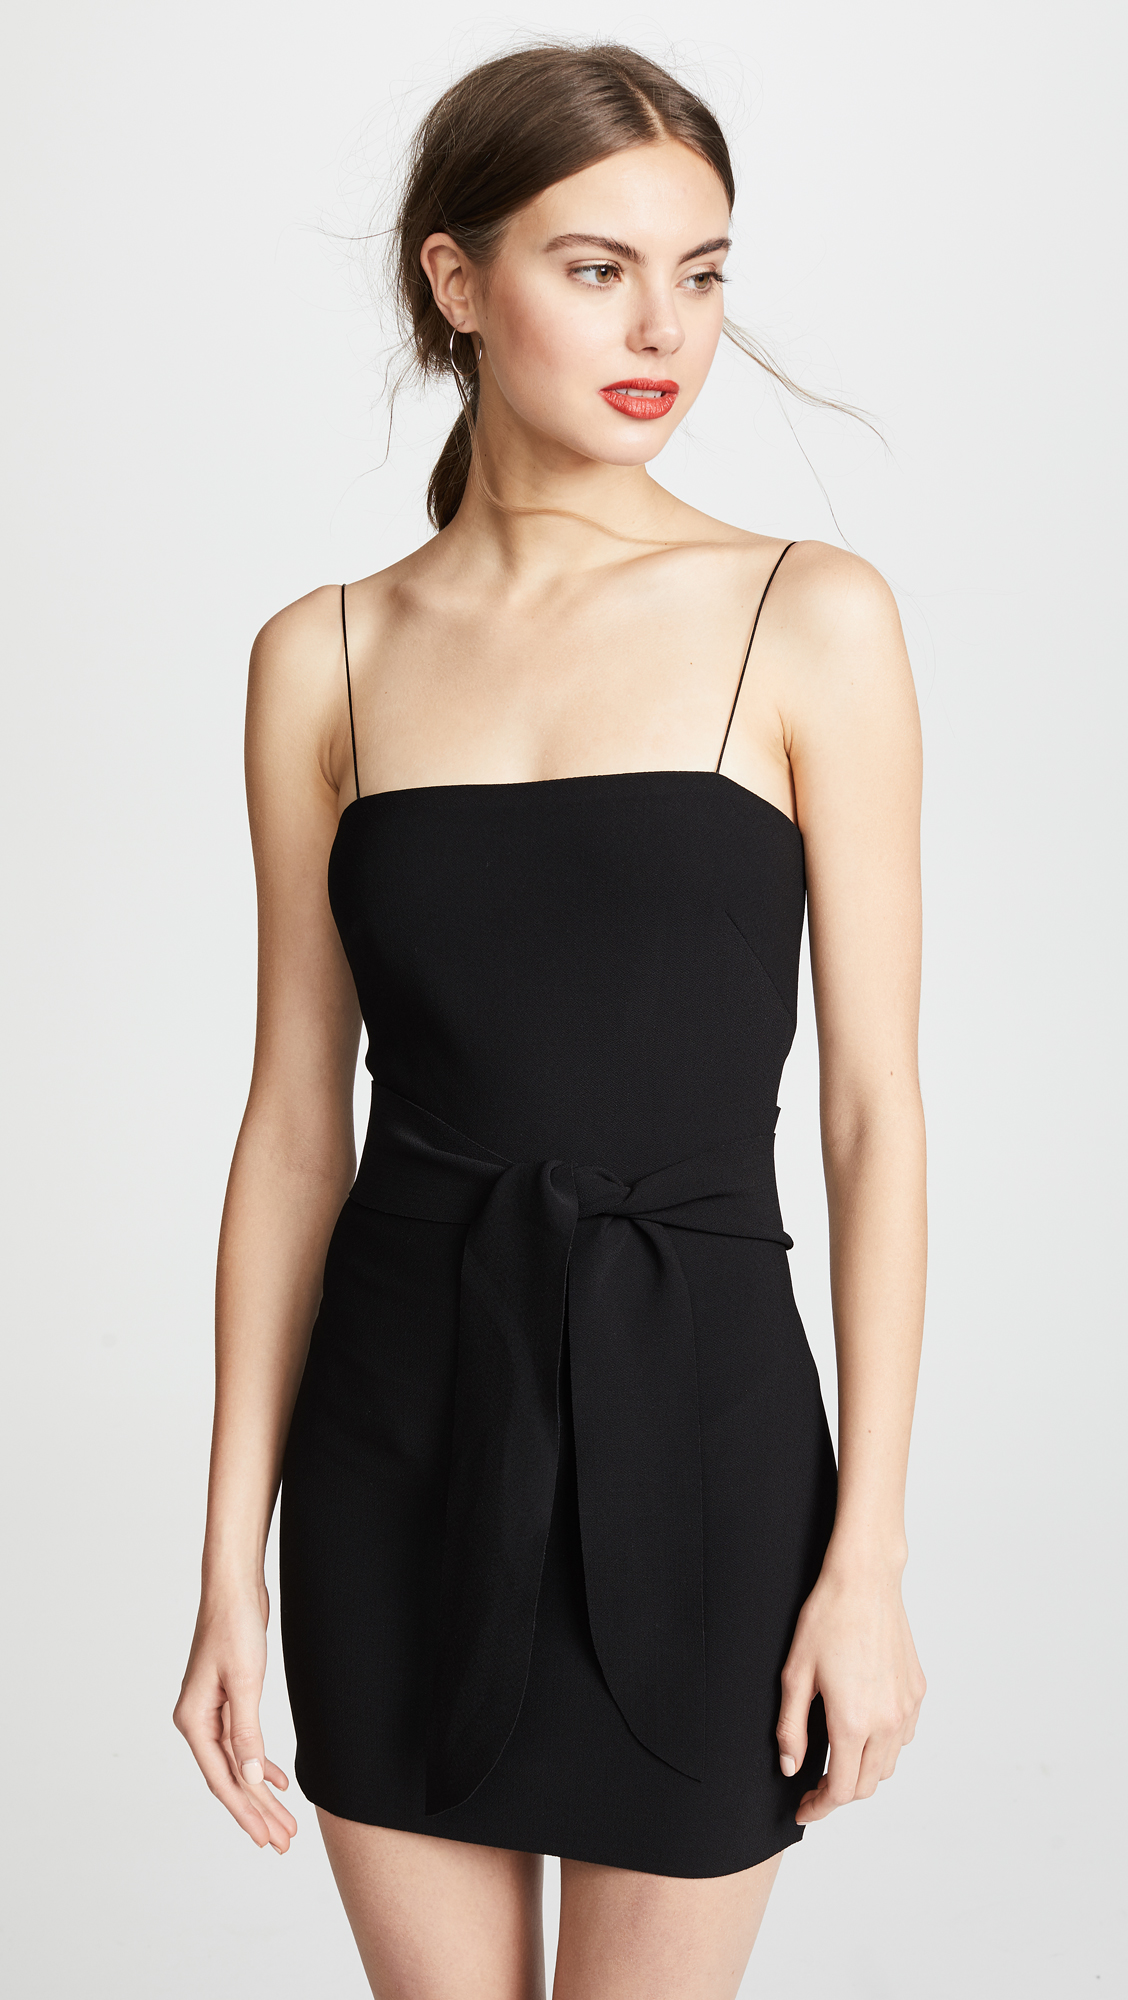 a10fb7f16c3 Buy Black Tie Dresses Online Australia - Gomes Weine AG